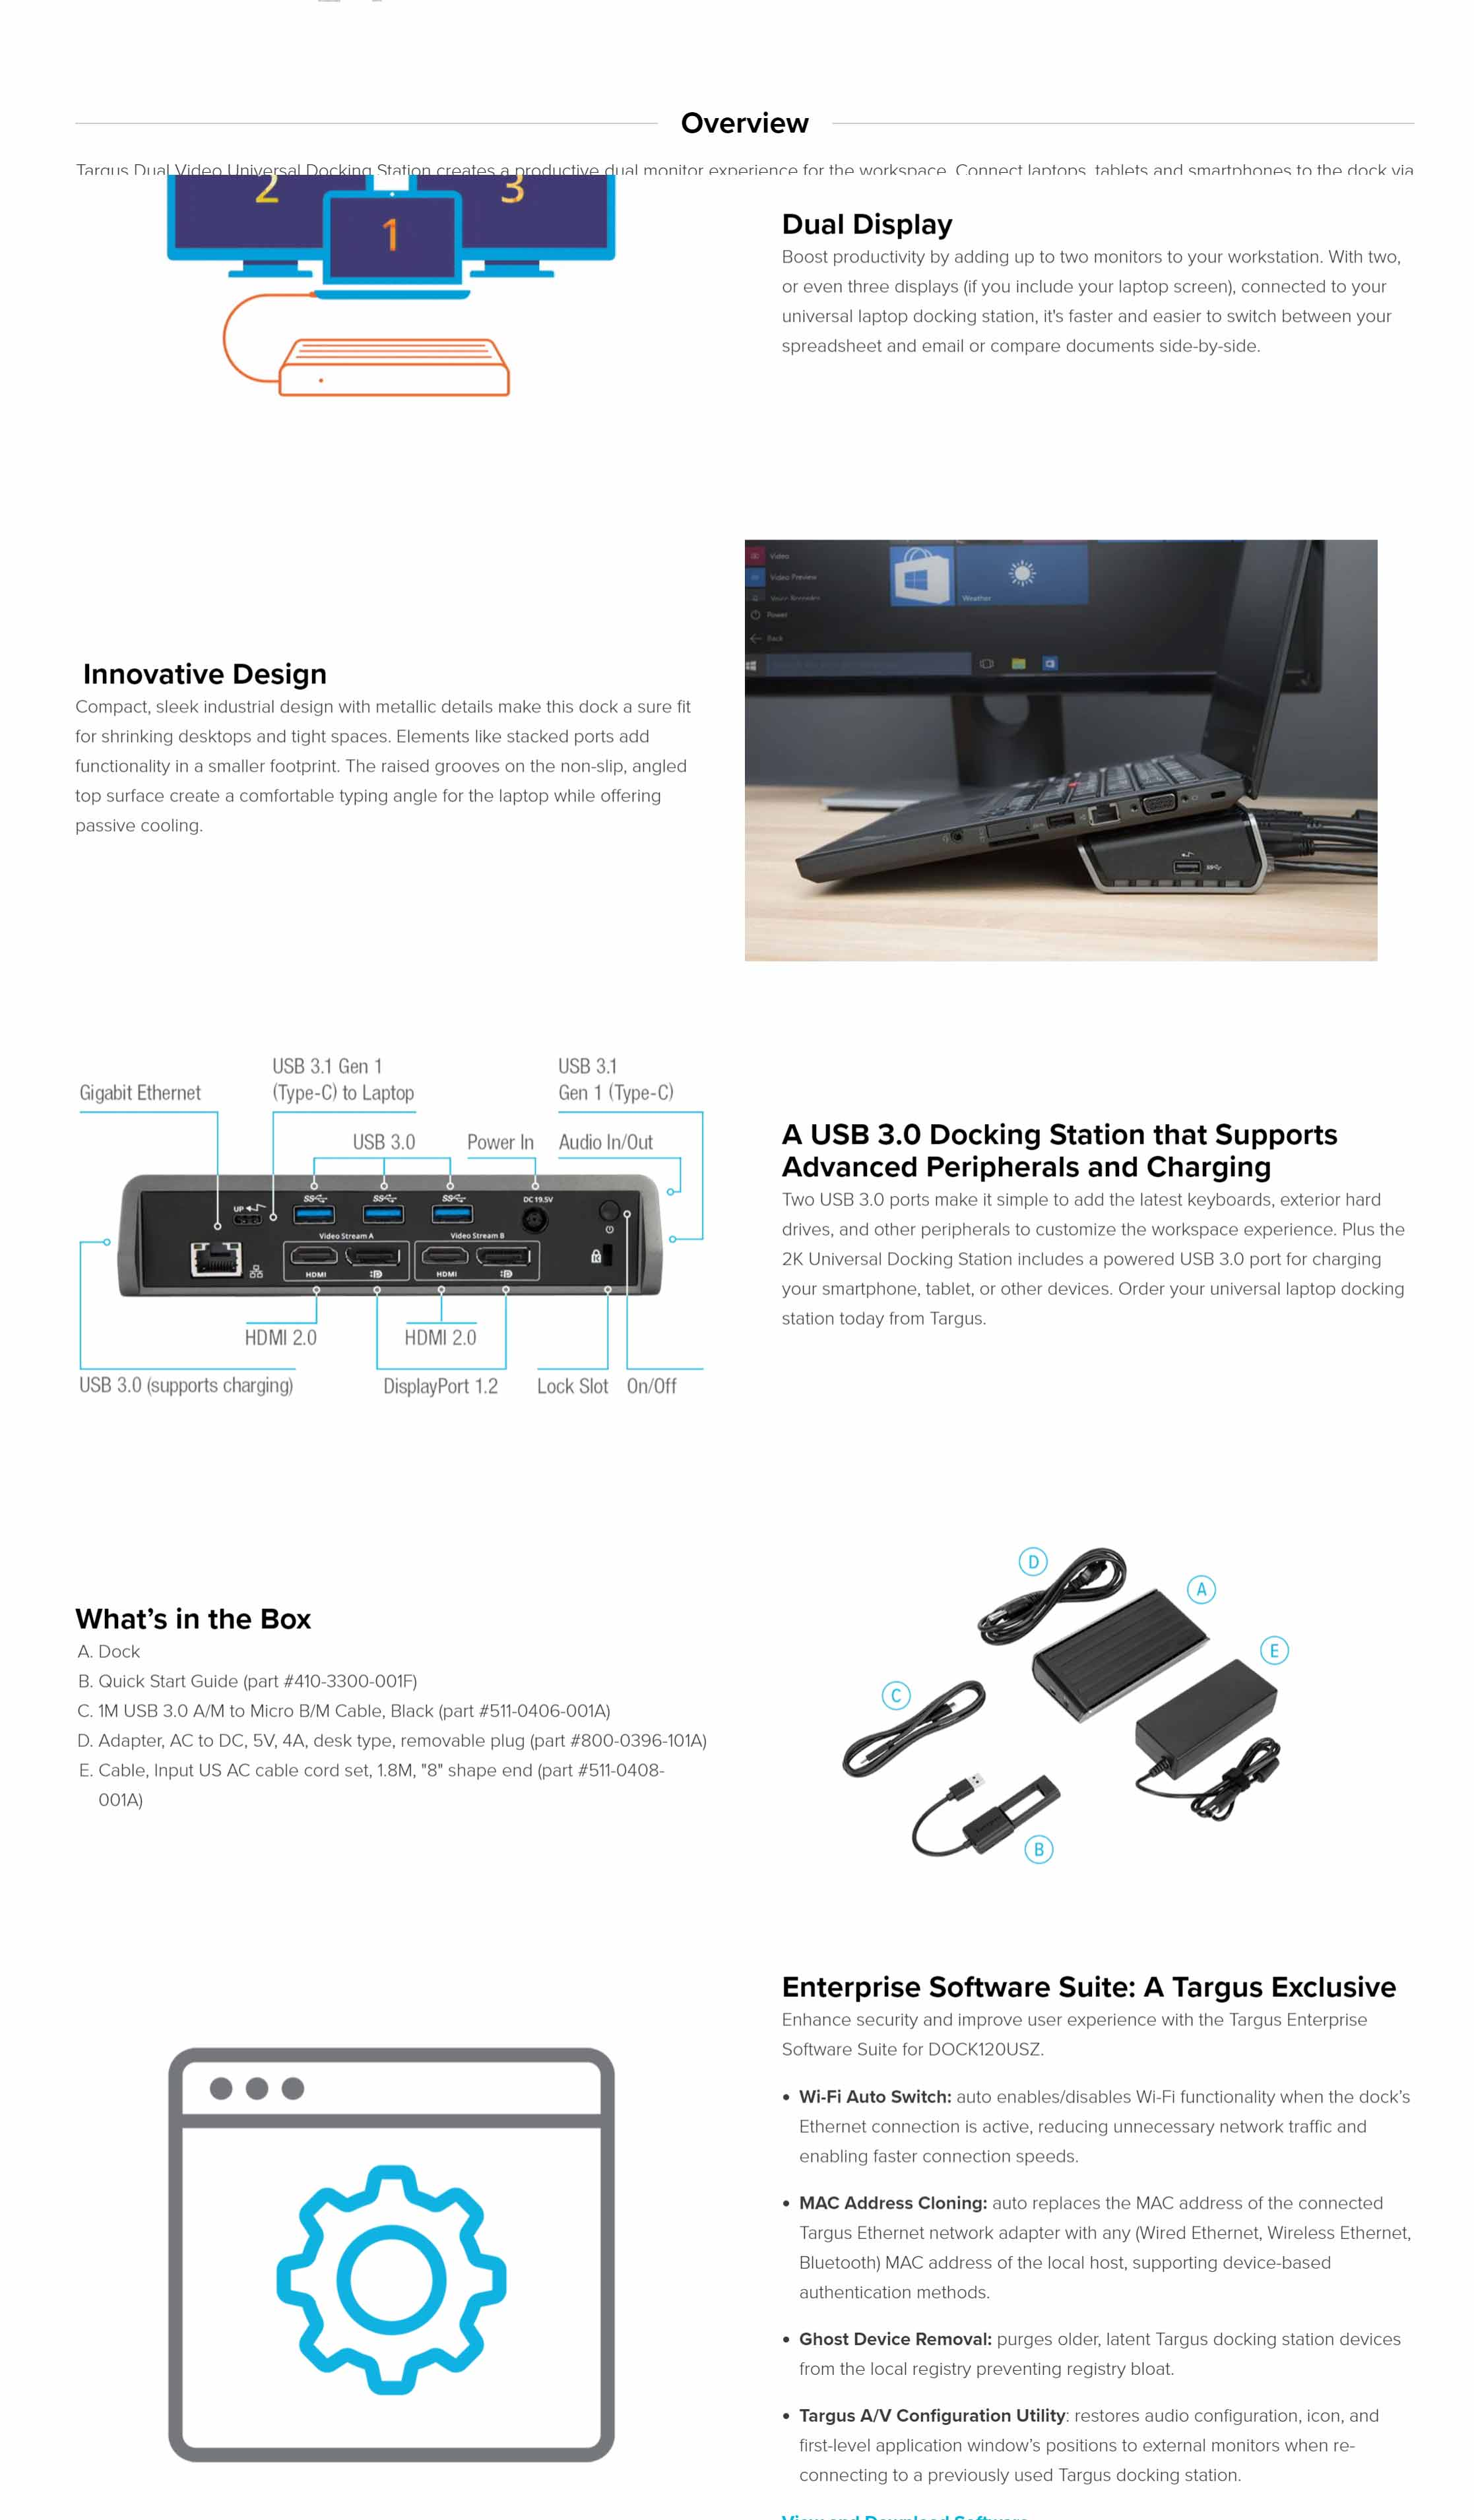 screencapture-au-targus-products-usb-3-0-dual-video-docking-station-dock120auz-2020-06-17-09_18_06.jpg